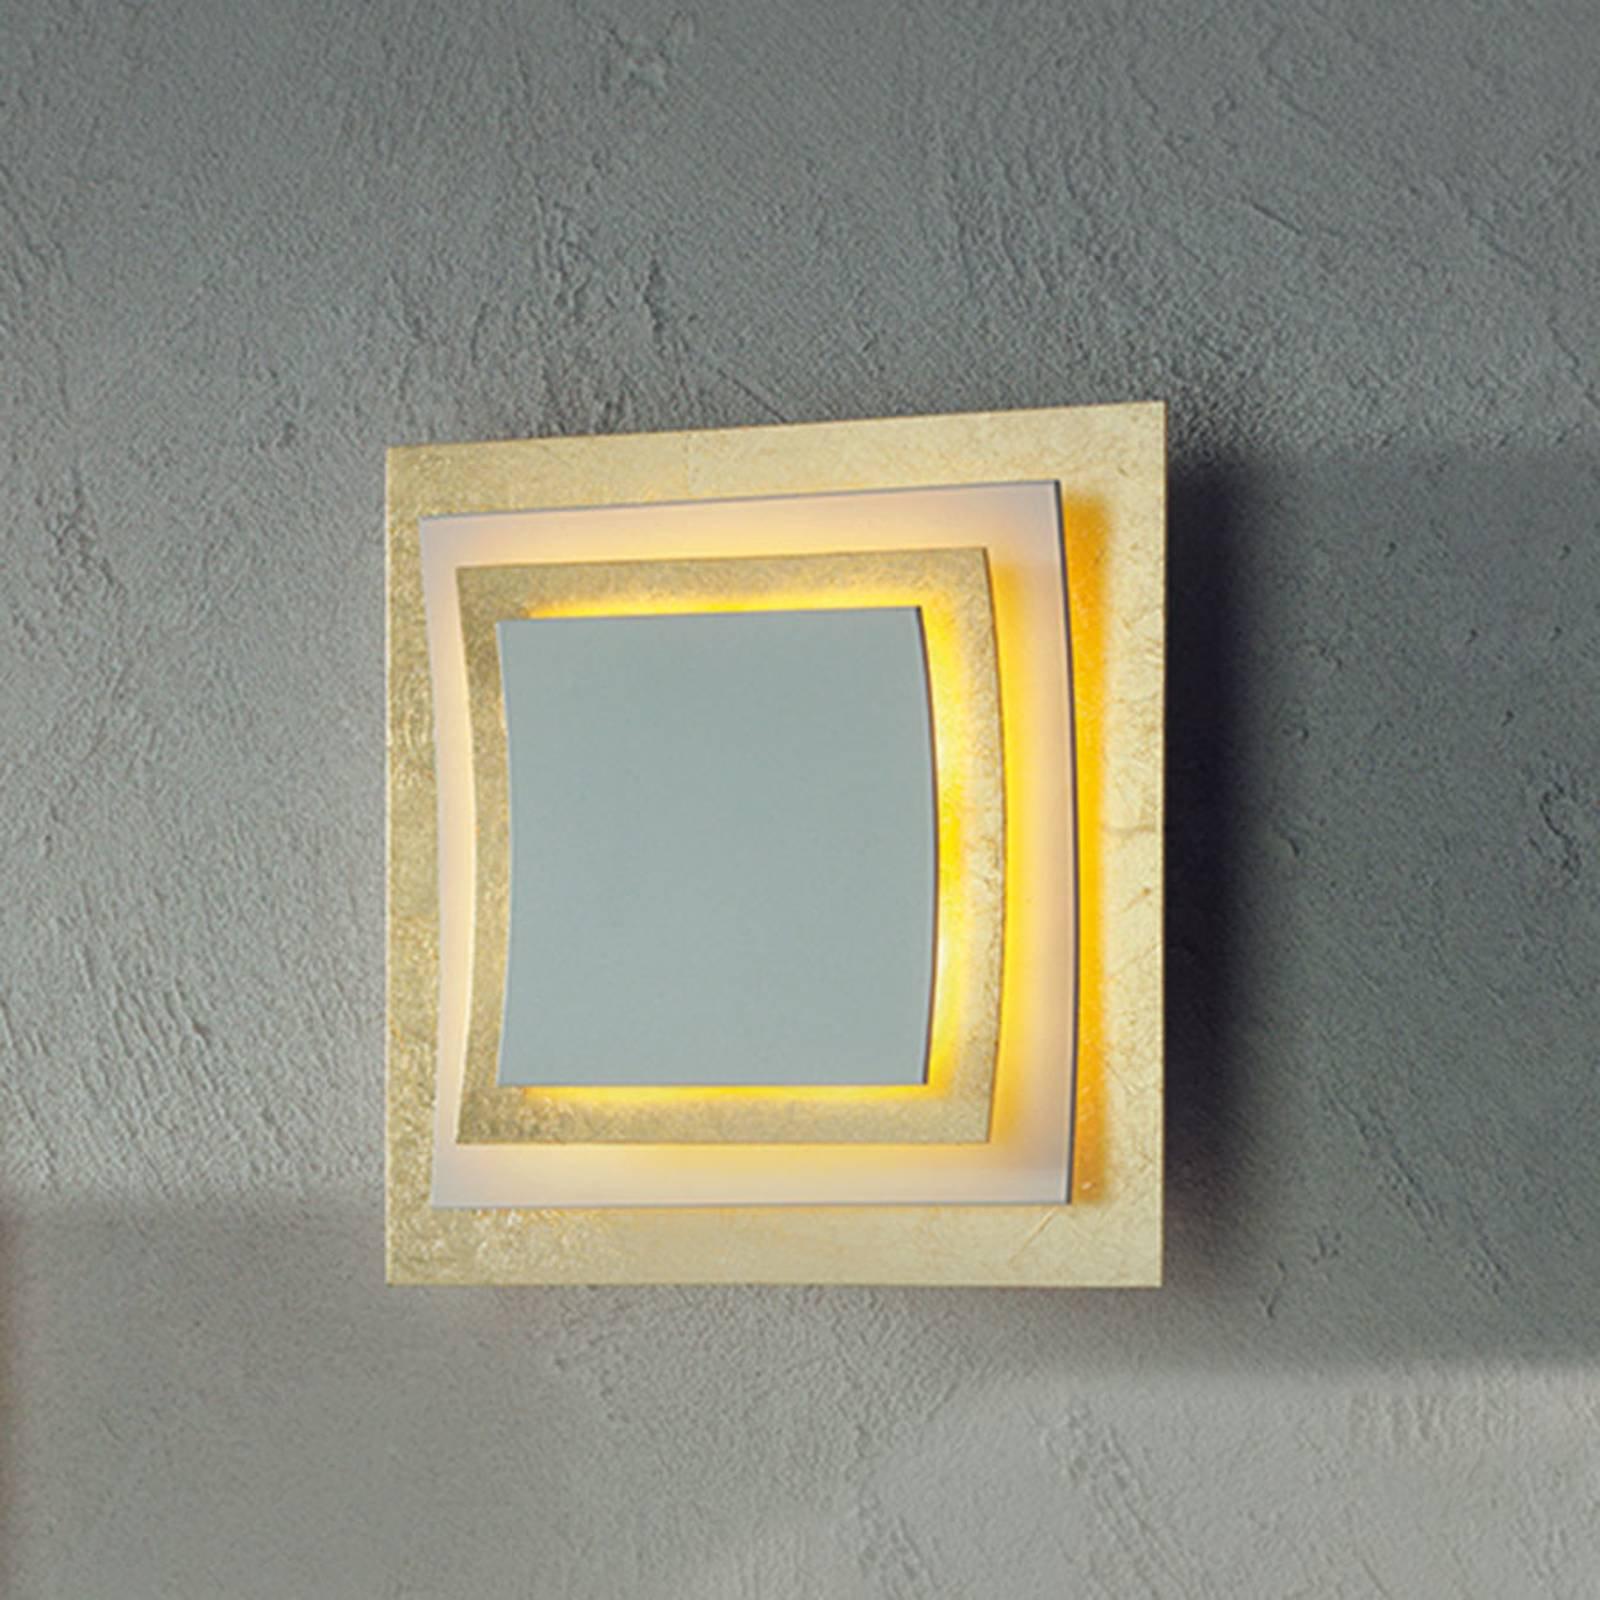 Pages vegg- og taklampe med bladgull, 22 cm